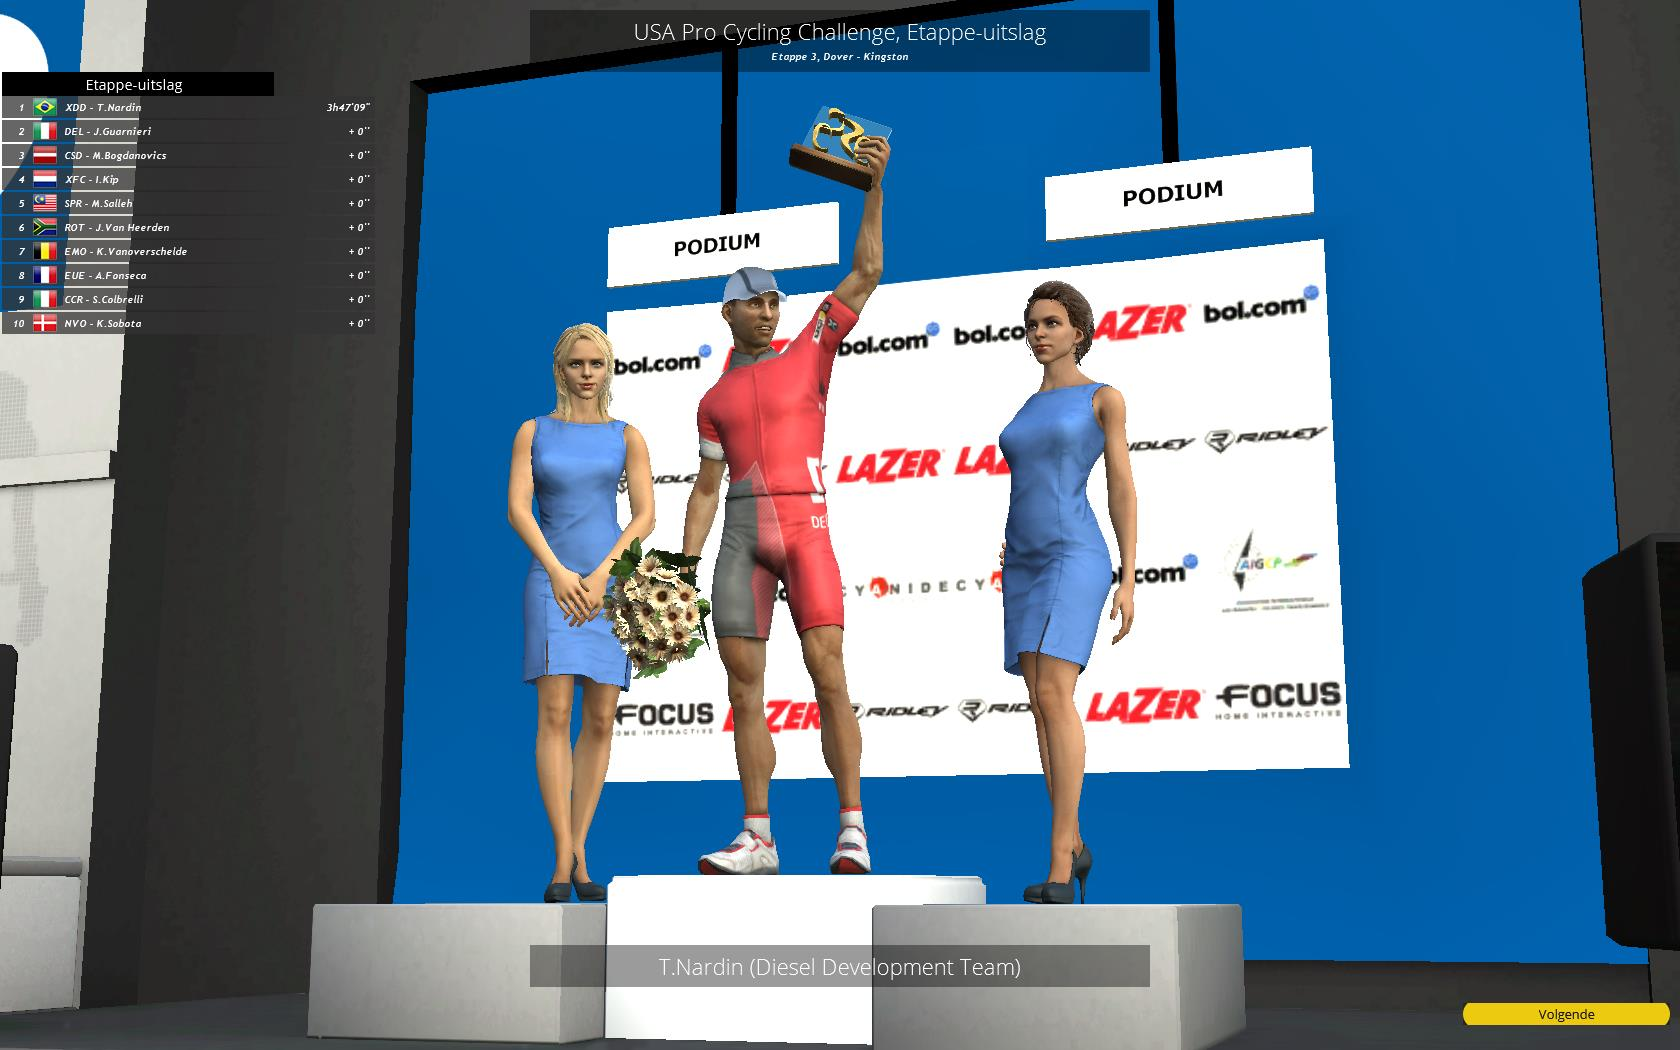 pcmdaily.com/images/mg/2018/Races/C2/USAPCC/3/PCM0014.jpg